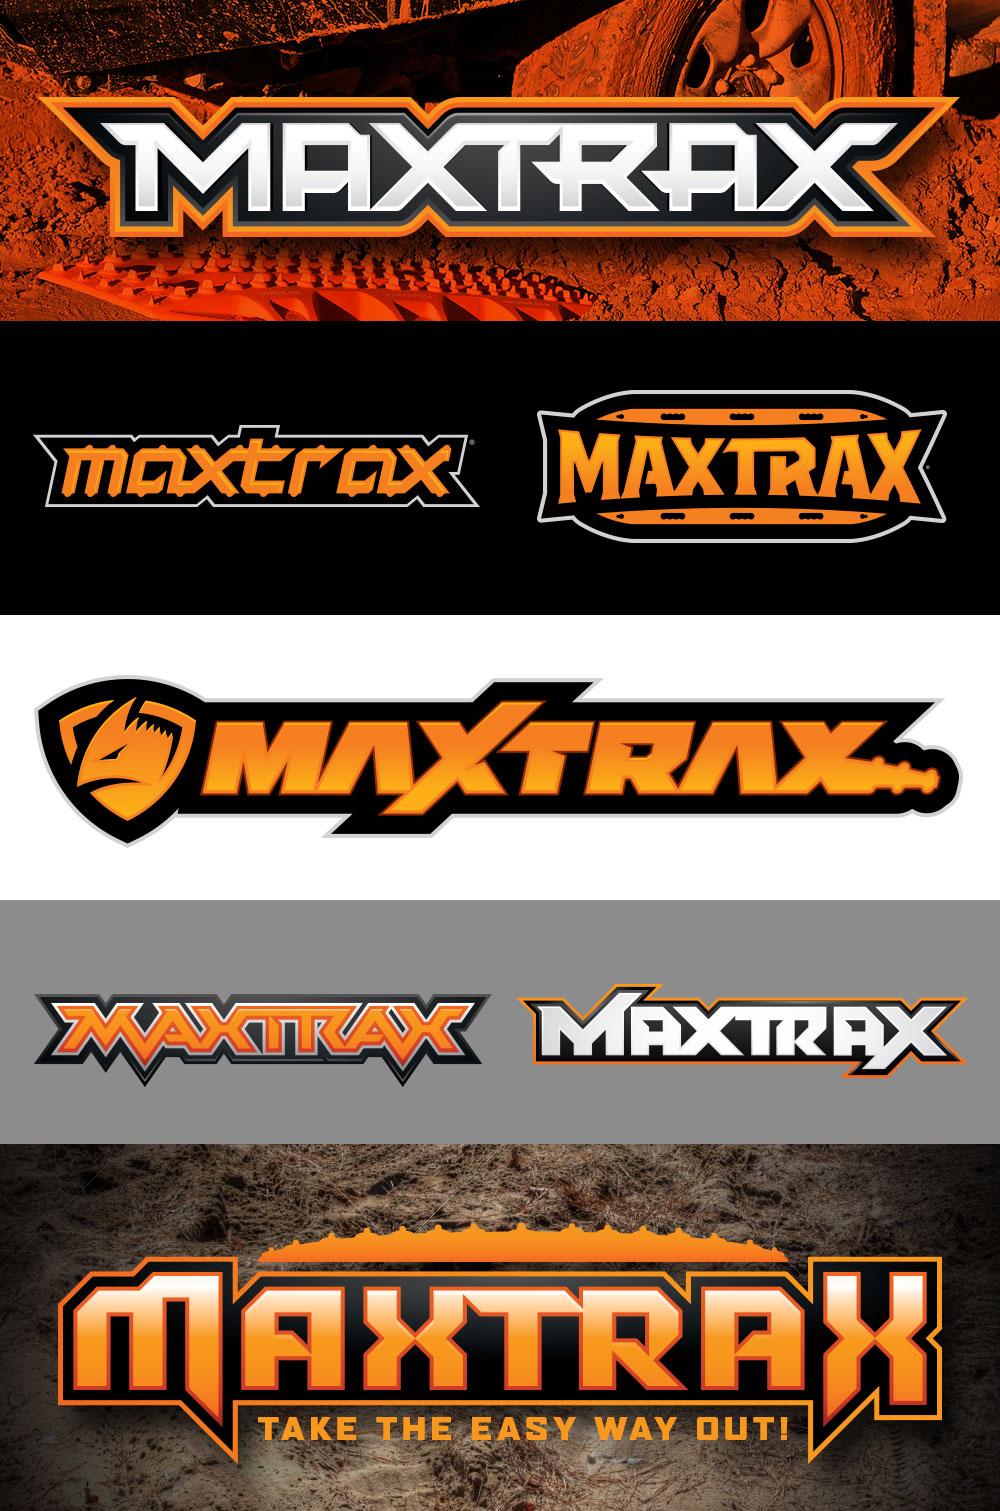 Maxtrax1.jpg